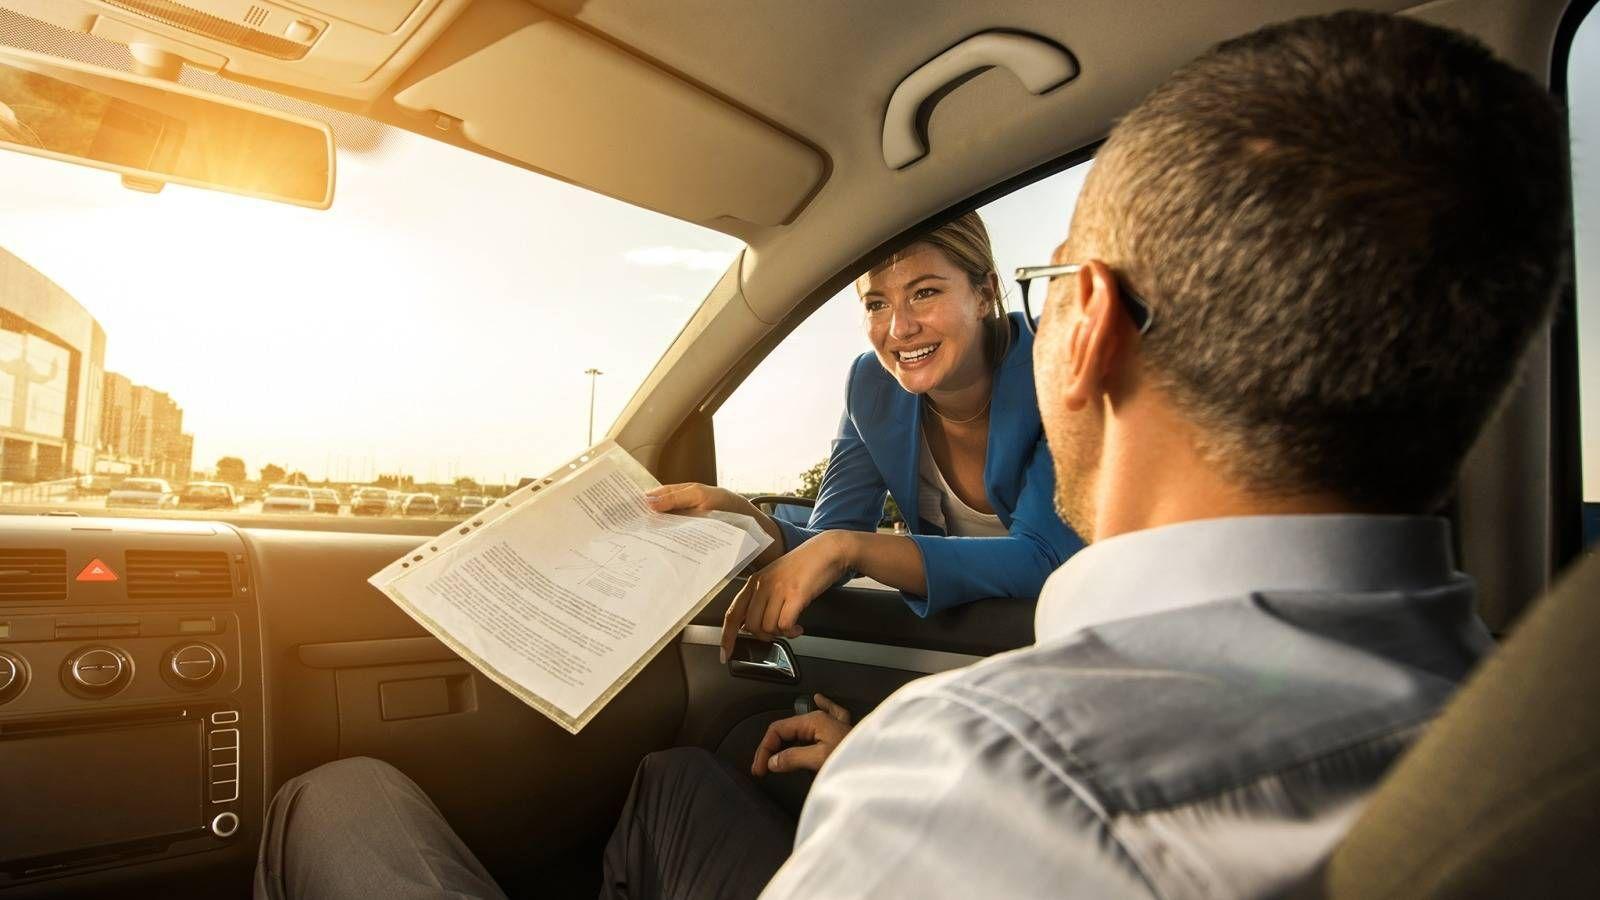 How to Negotiate Car Prices Car prices, Tesla price